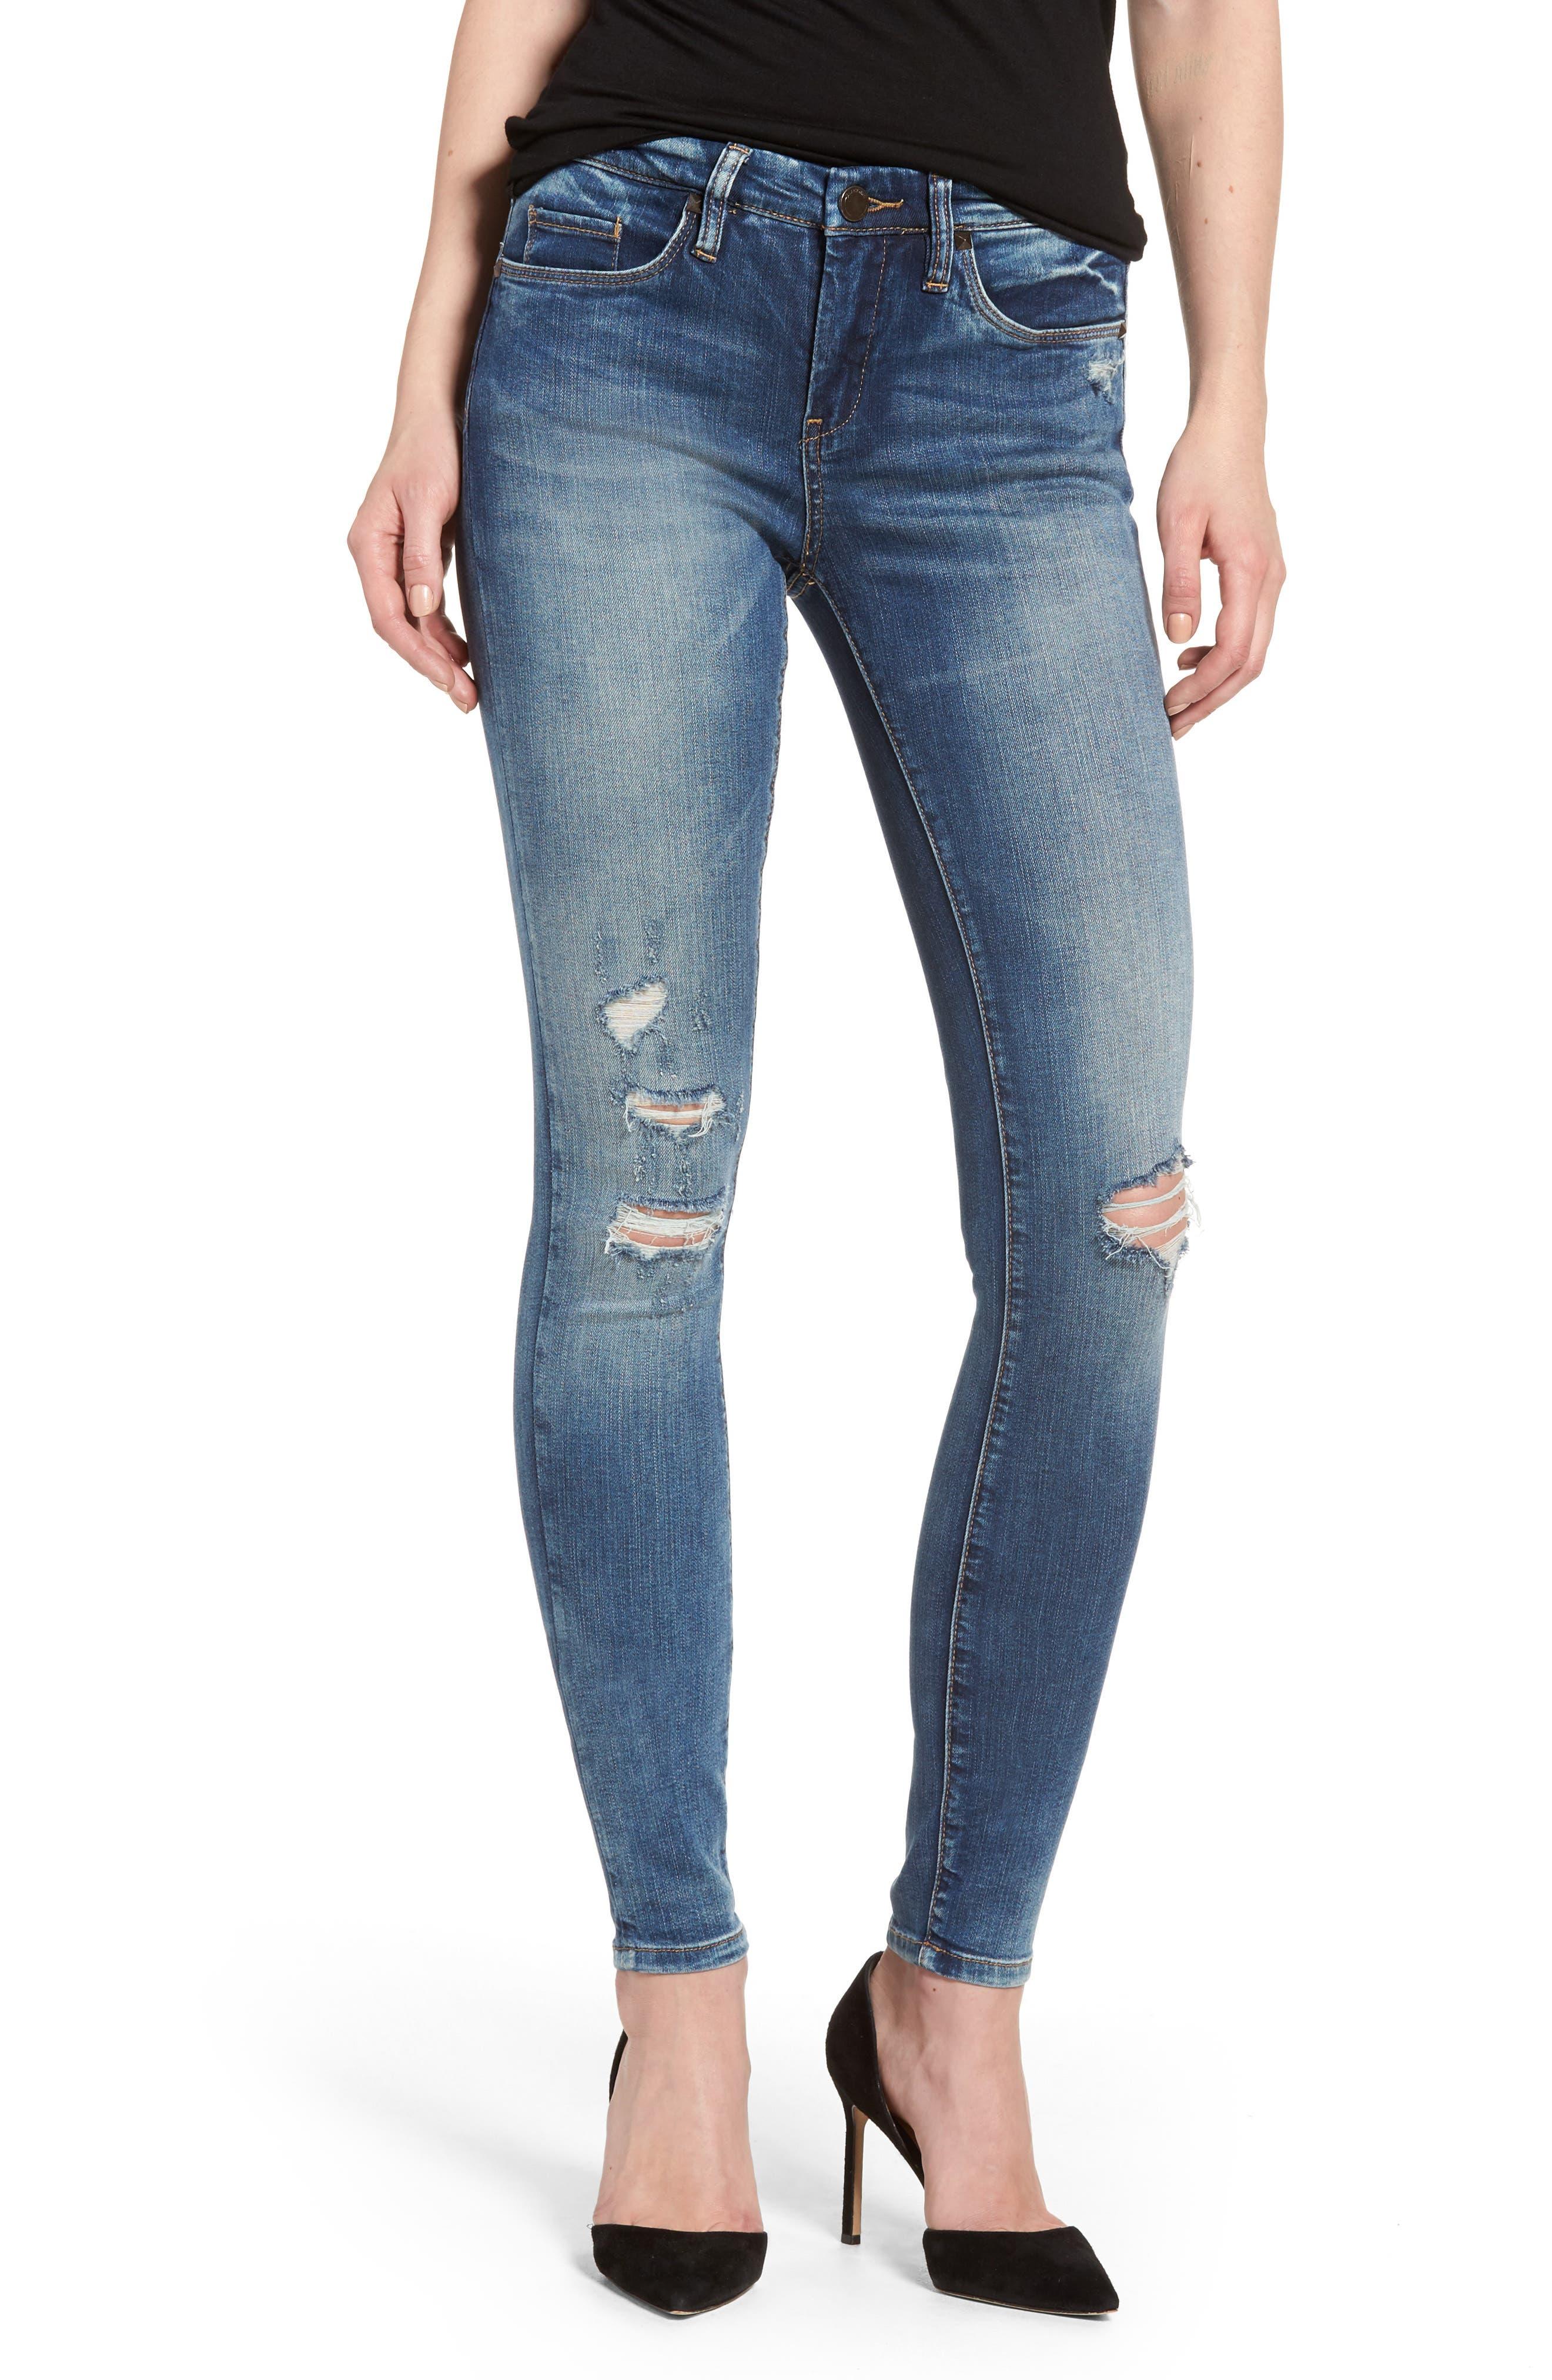 BLANKNYC Cofffee Nap Ripped Skinny Jeans